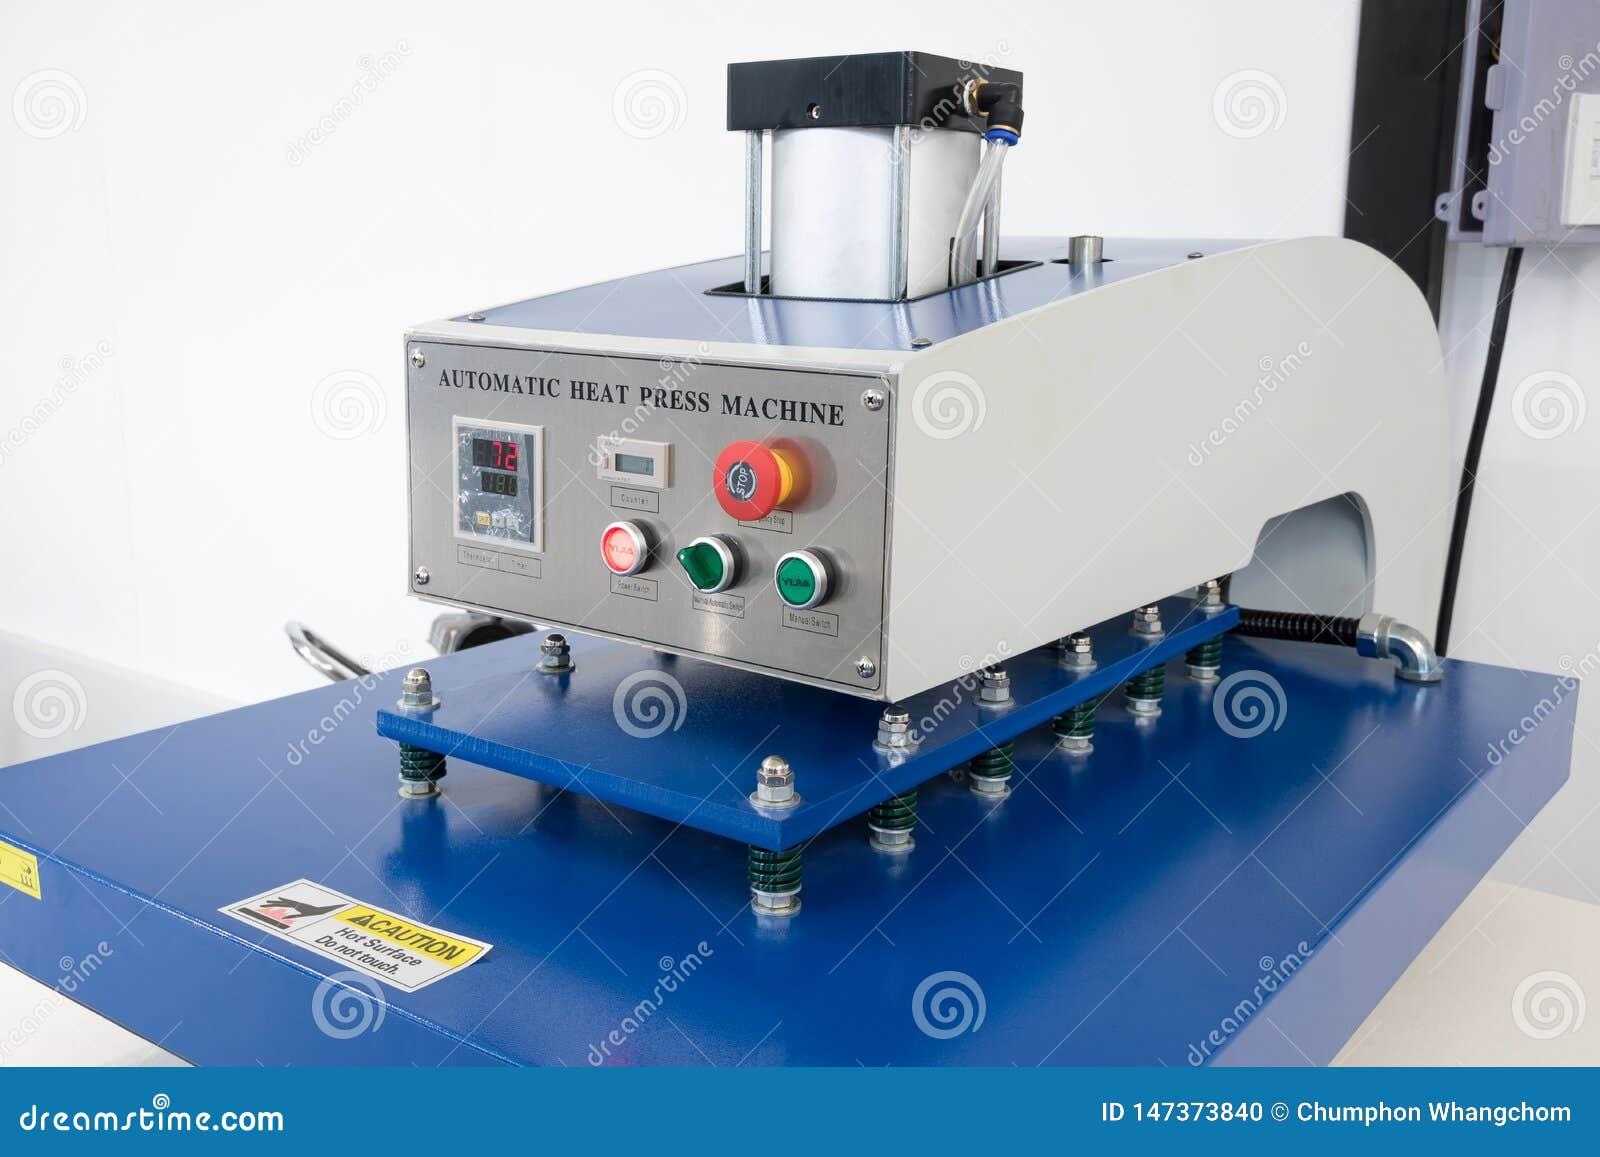 Pathumthani, Ταϊλάνδη - 27 Φεβρουαρίου 2017: Μεγάλη μηχανή Τύπου θερμότητας για την επιχείρηση υφάσματος στο εργοστάσιο εκτύπωσης